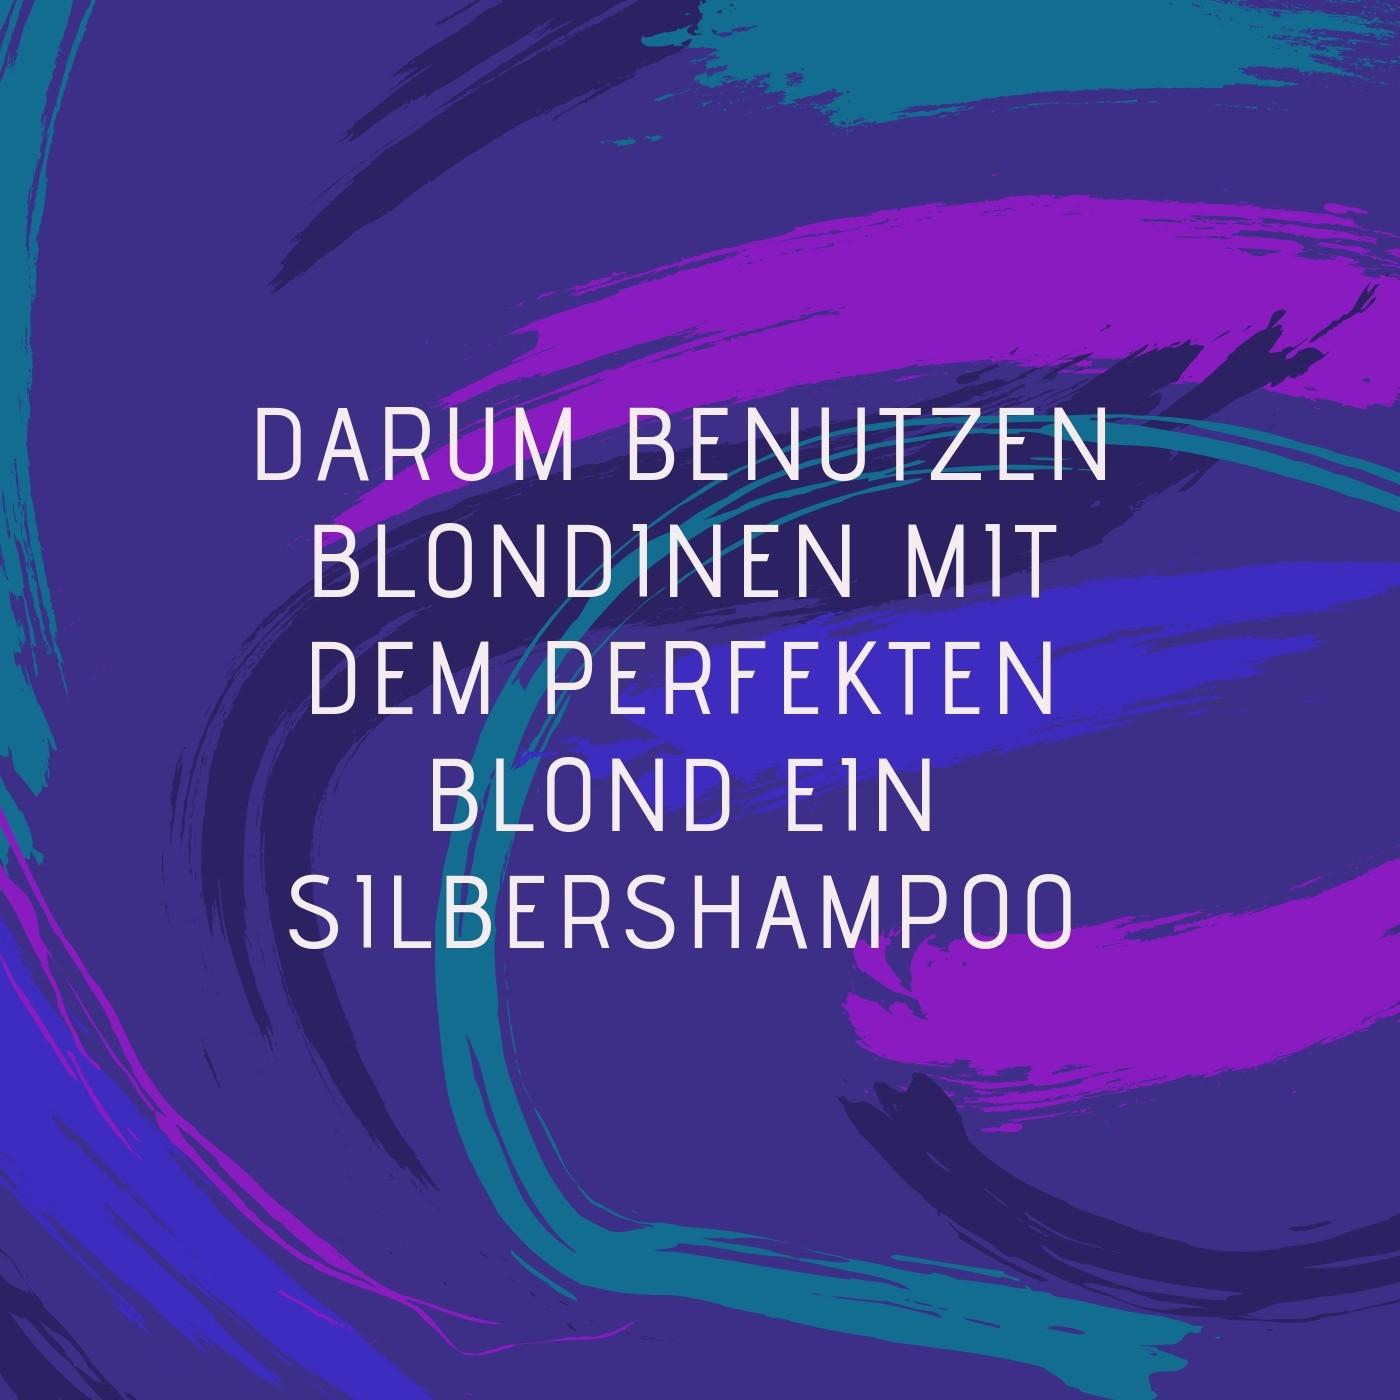 Silbershampoo